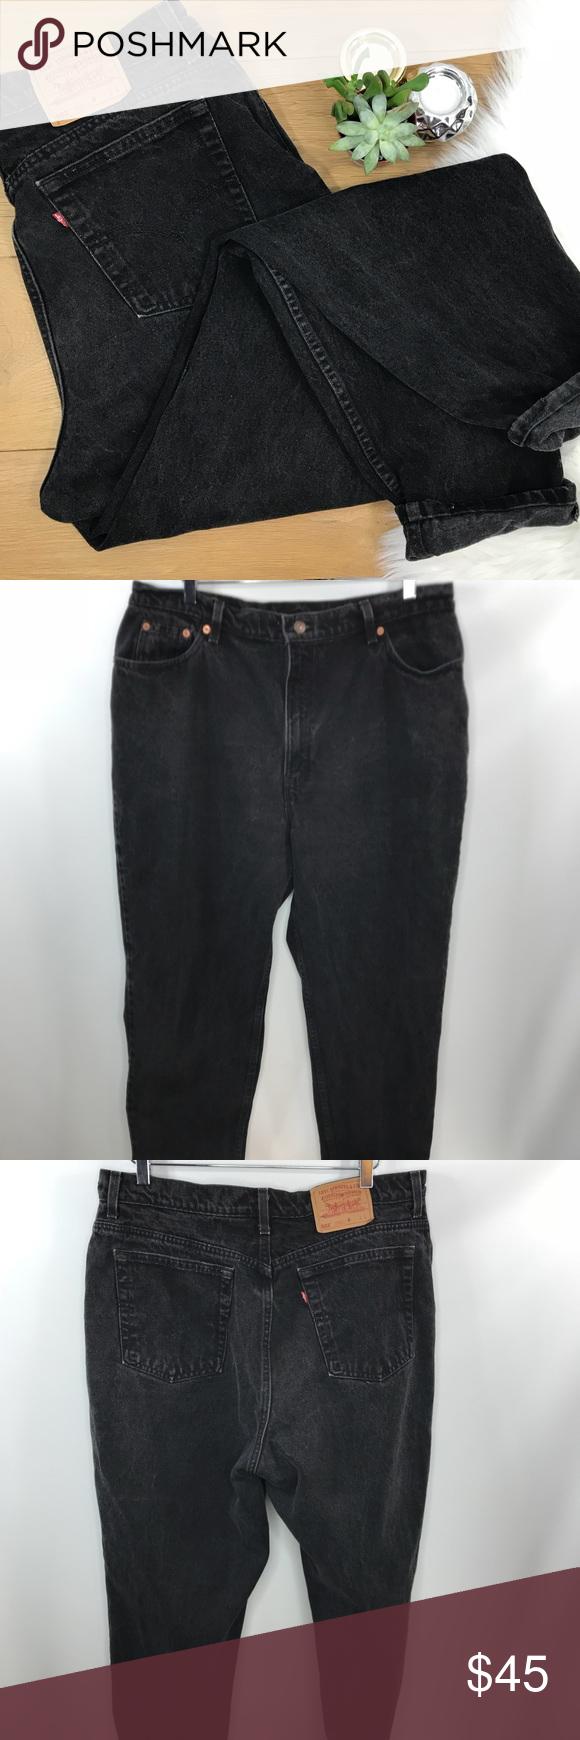 Levi S Black 522 Mom Jeans 460 My Posh Closet Pinterest Black